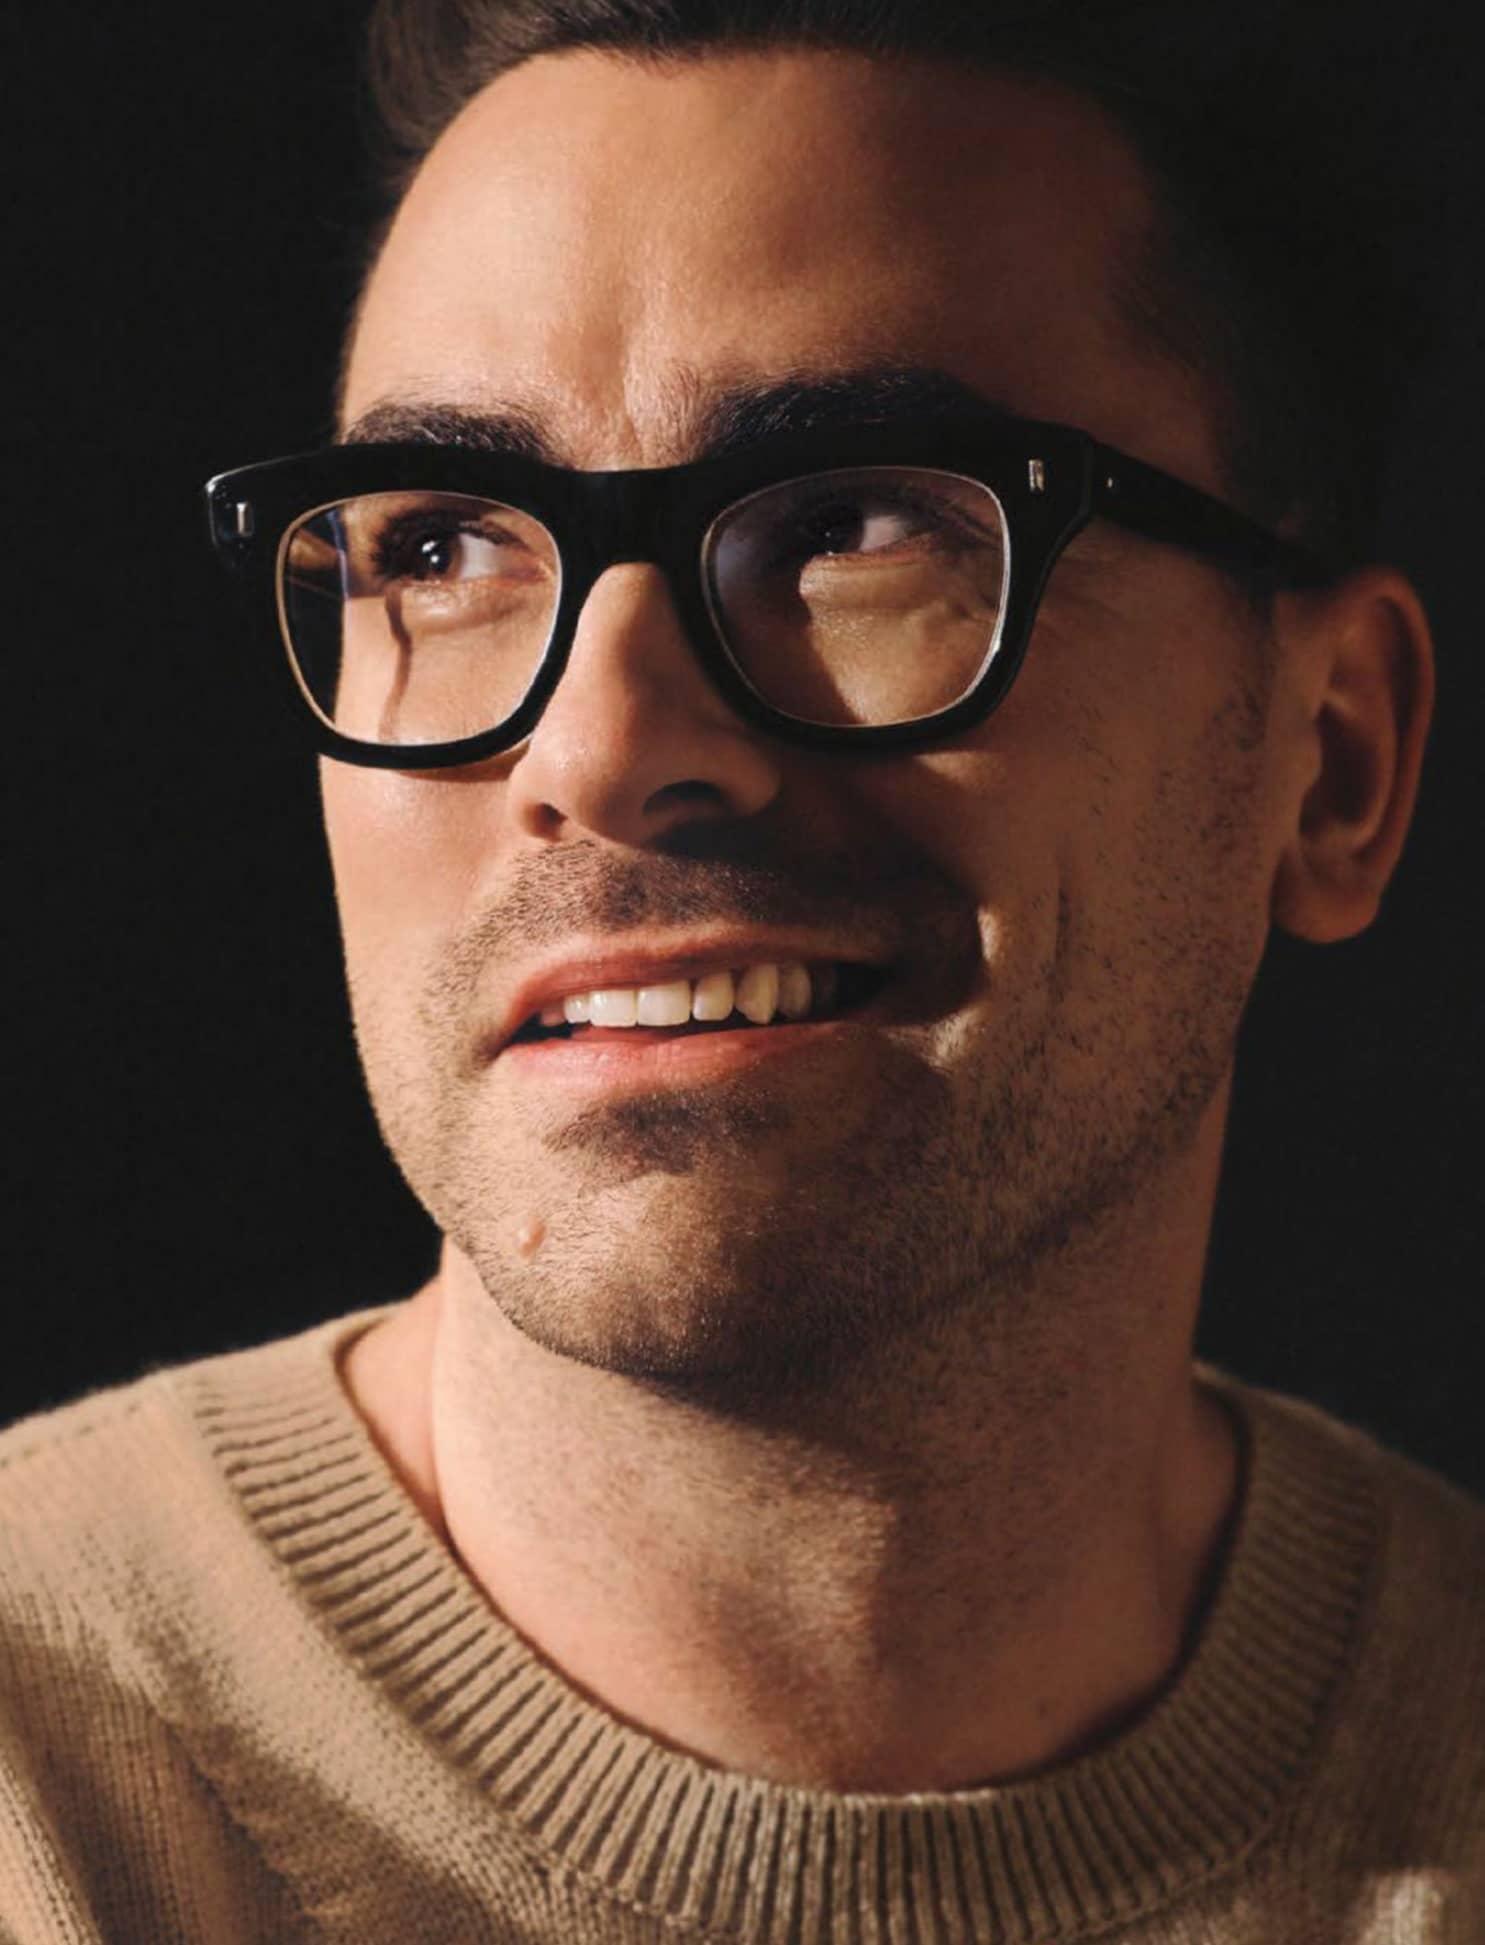 Dan Levy On The Comedic Alchemy Behind Schitt's Creek